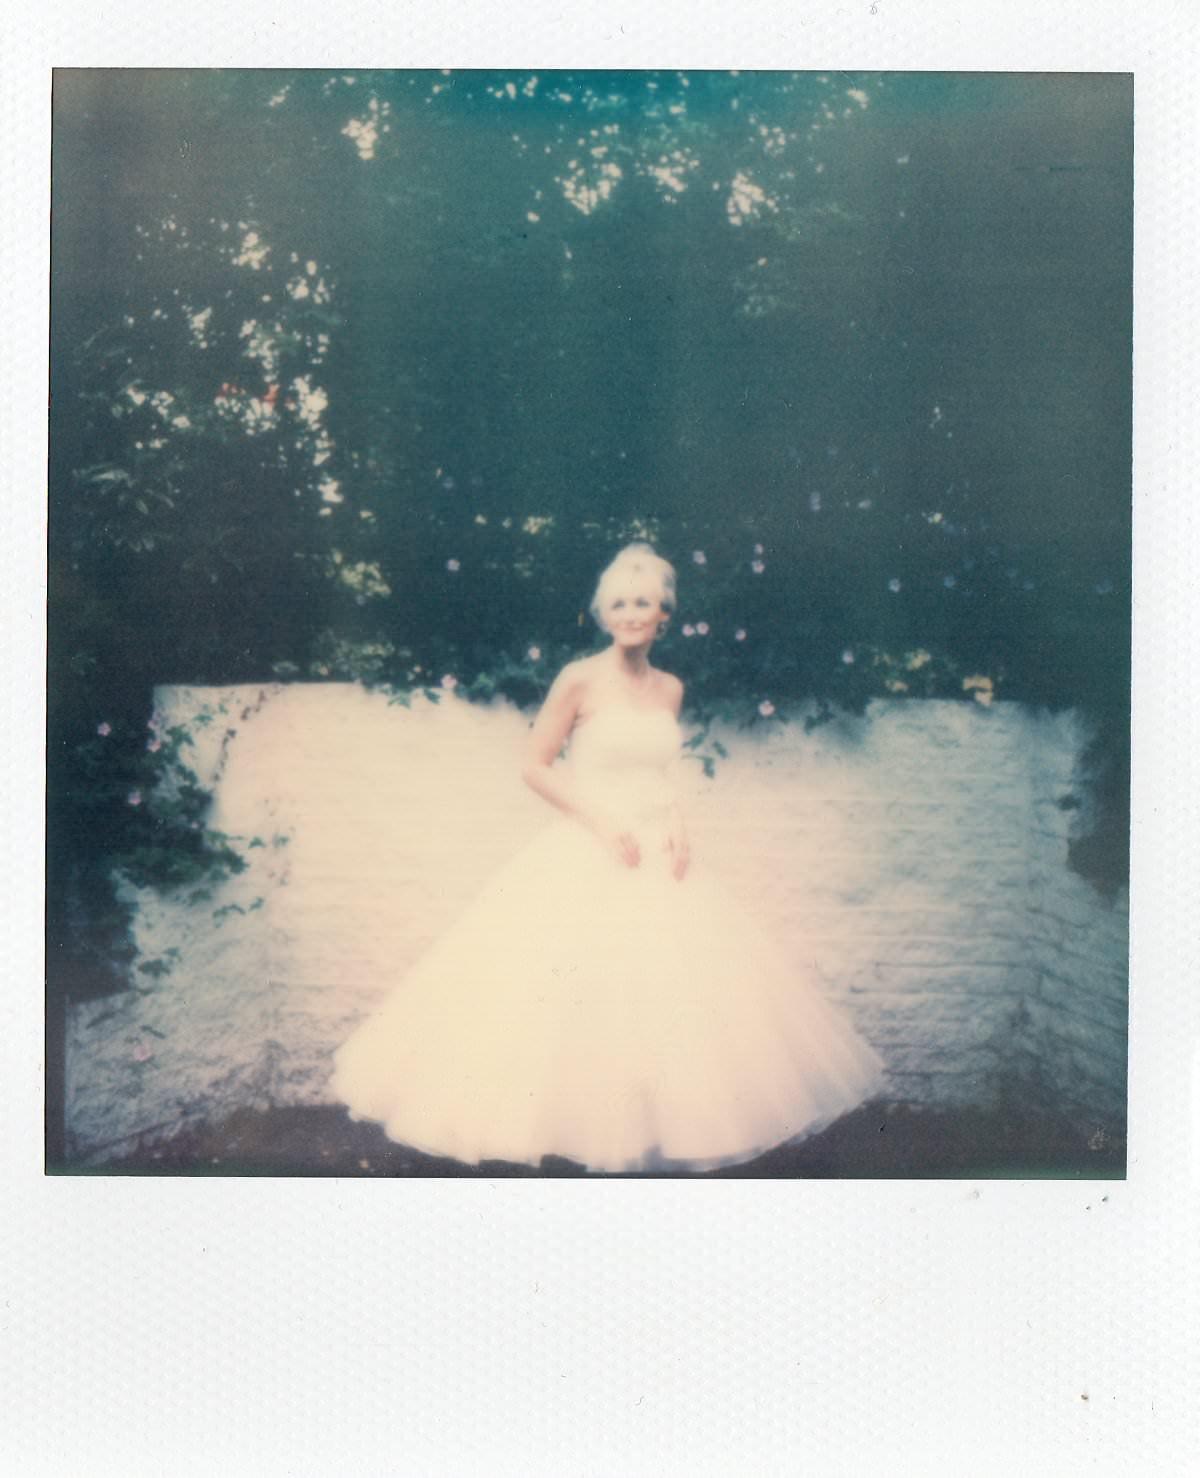 fine-art-artistic-wedding-photographer-092